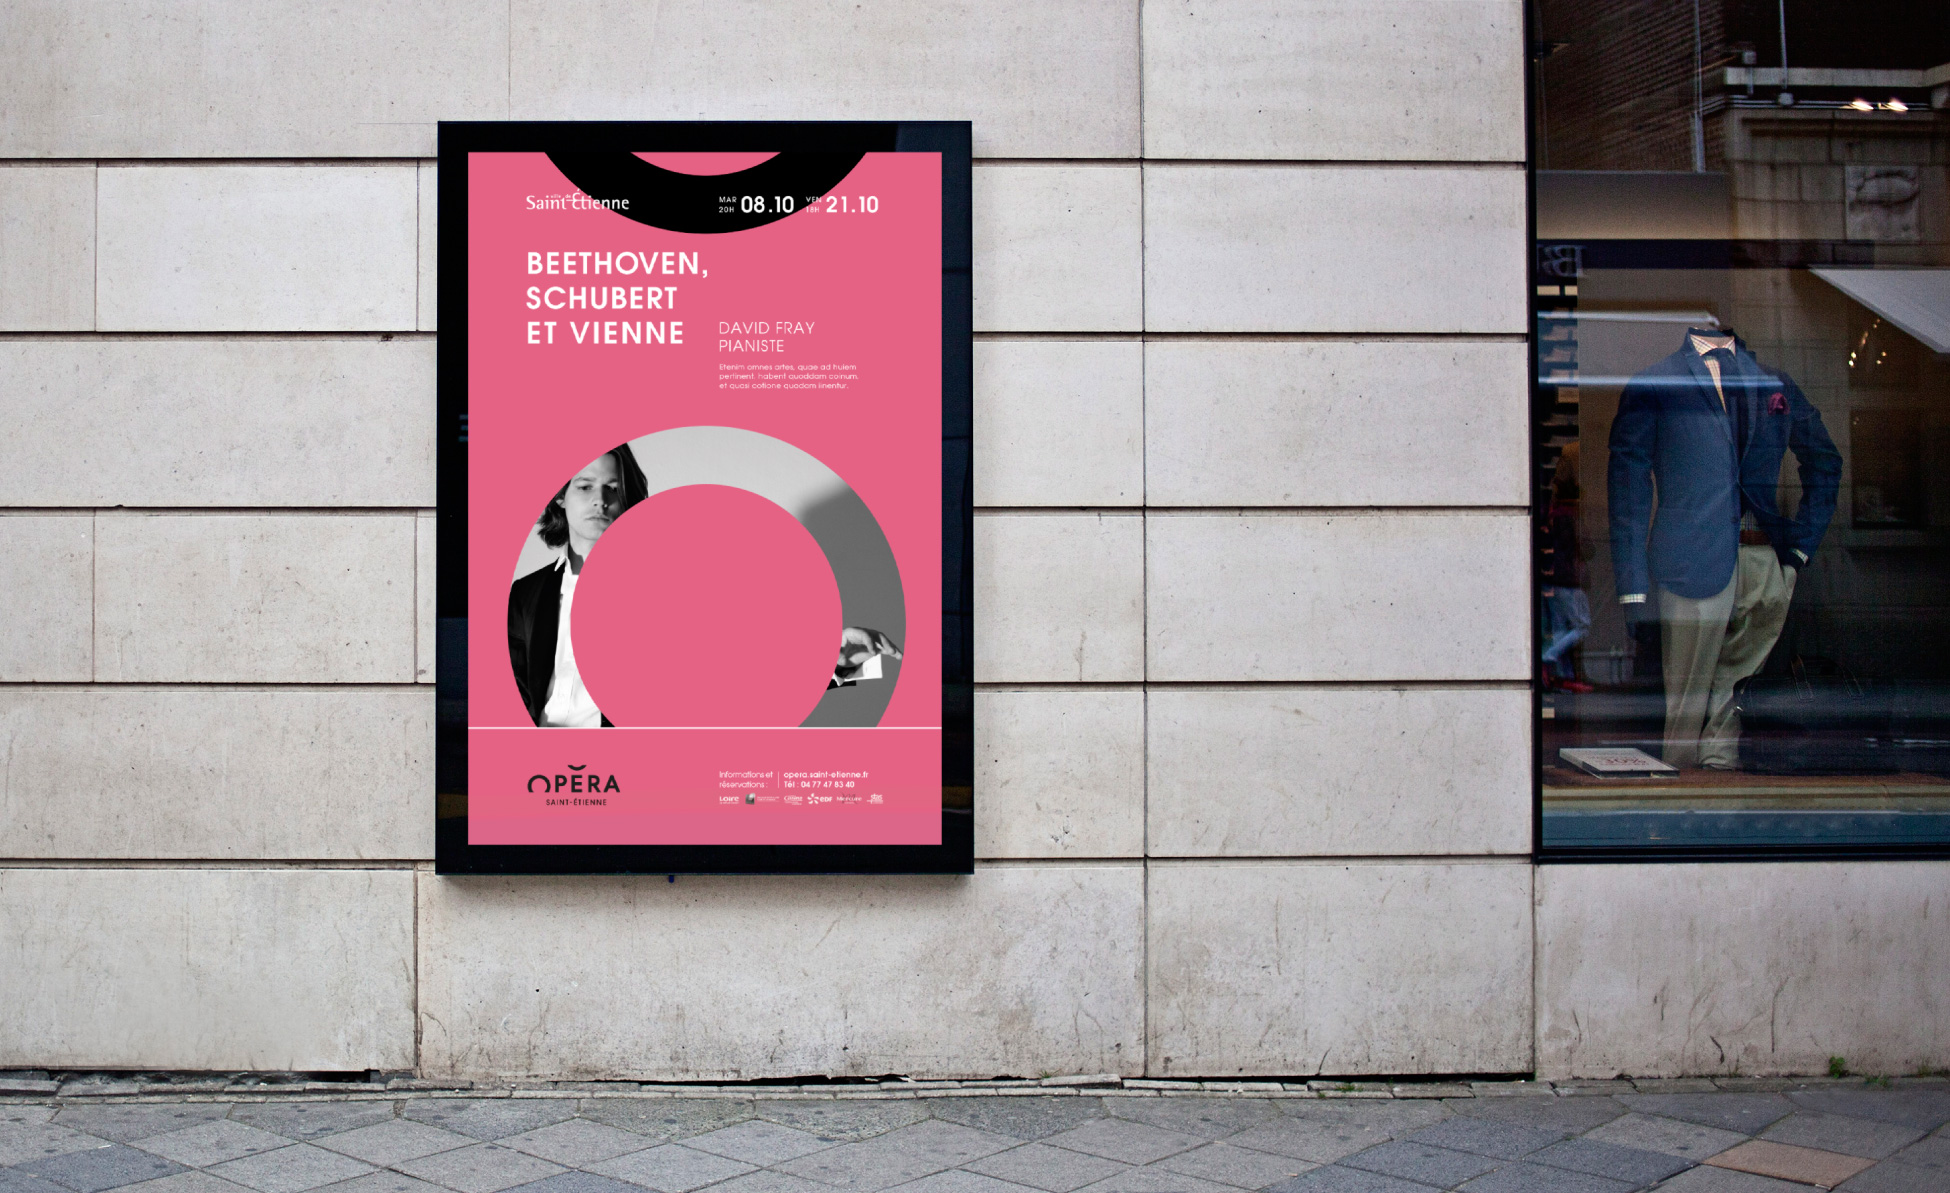 New branding of the Sainttienne Opera House